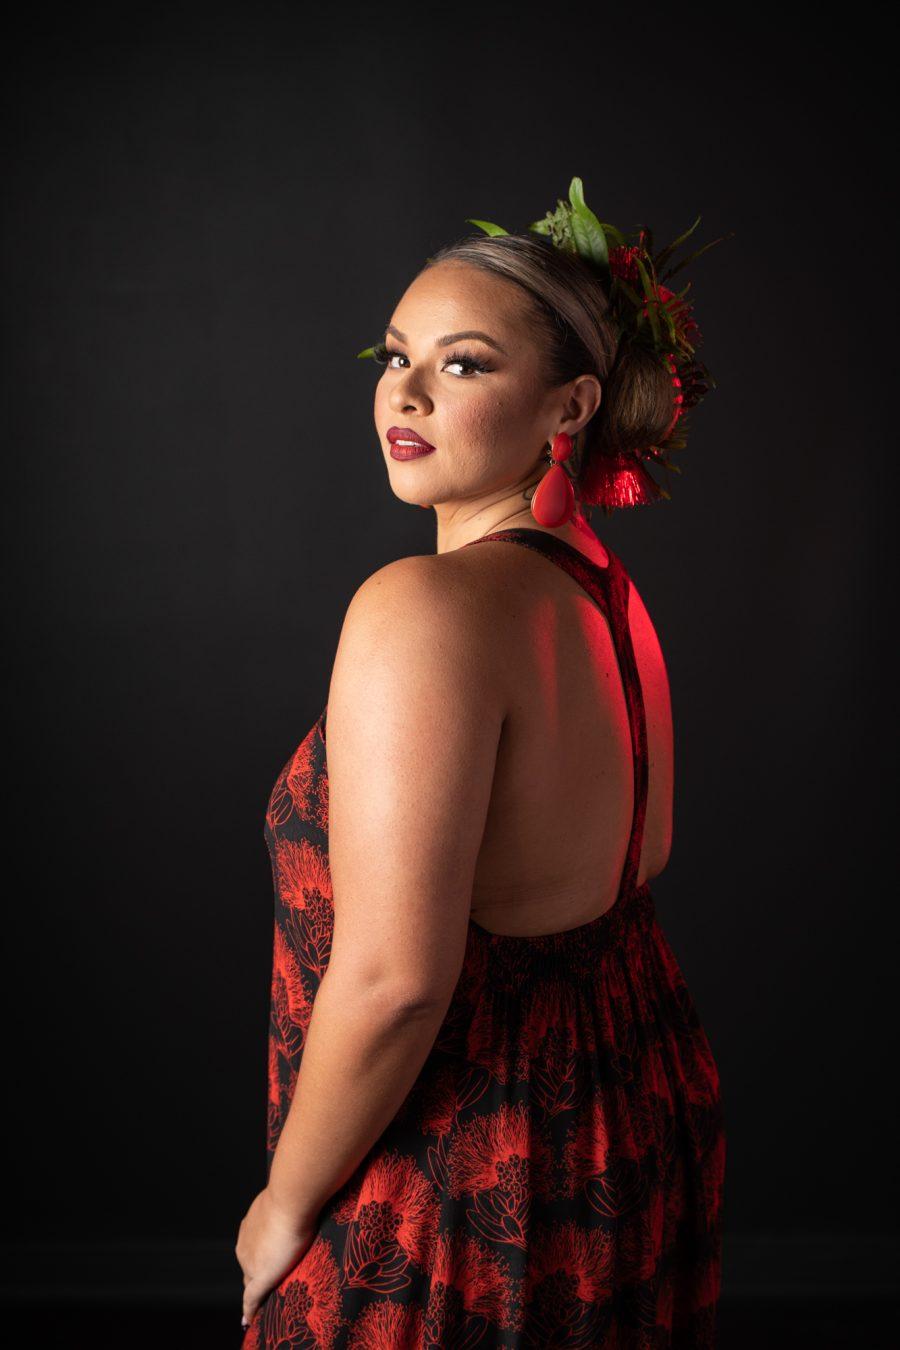 Model wearing Ihilani Dress in Black Firey Red Kalihilehua Pattern - Back View